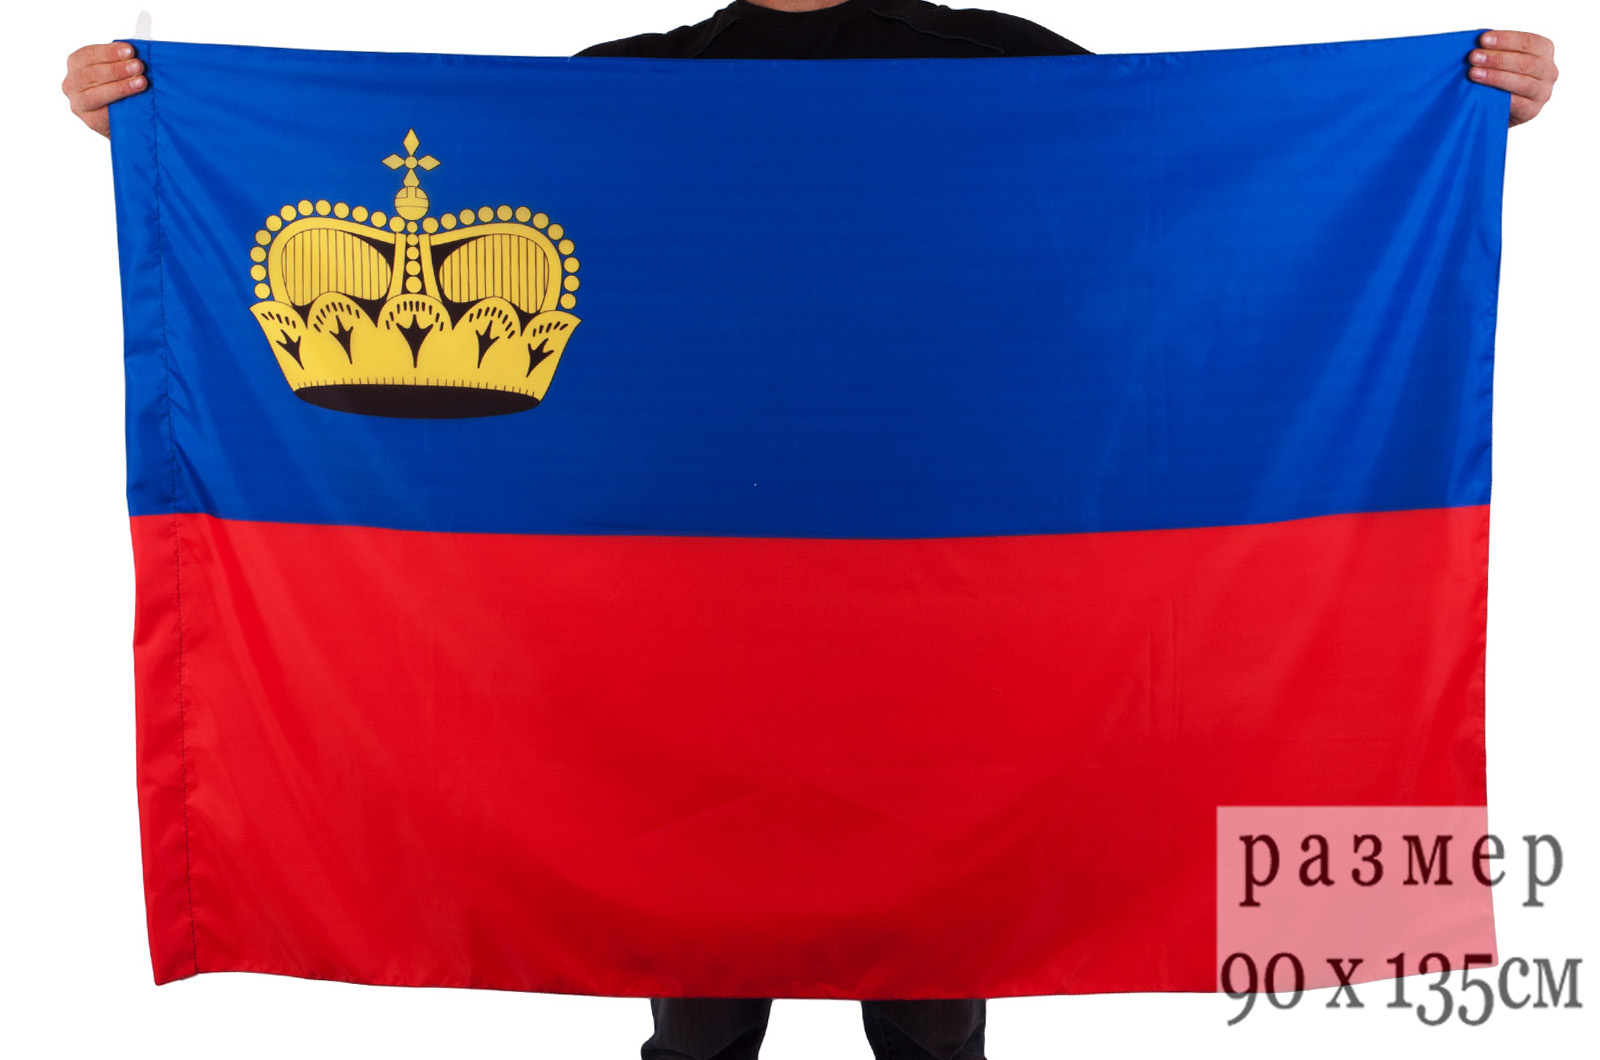 Флаг Лихтенштейна, купить флаг Лихтенштейна